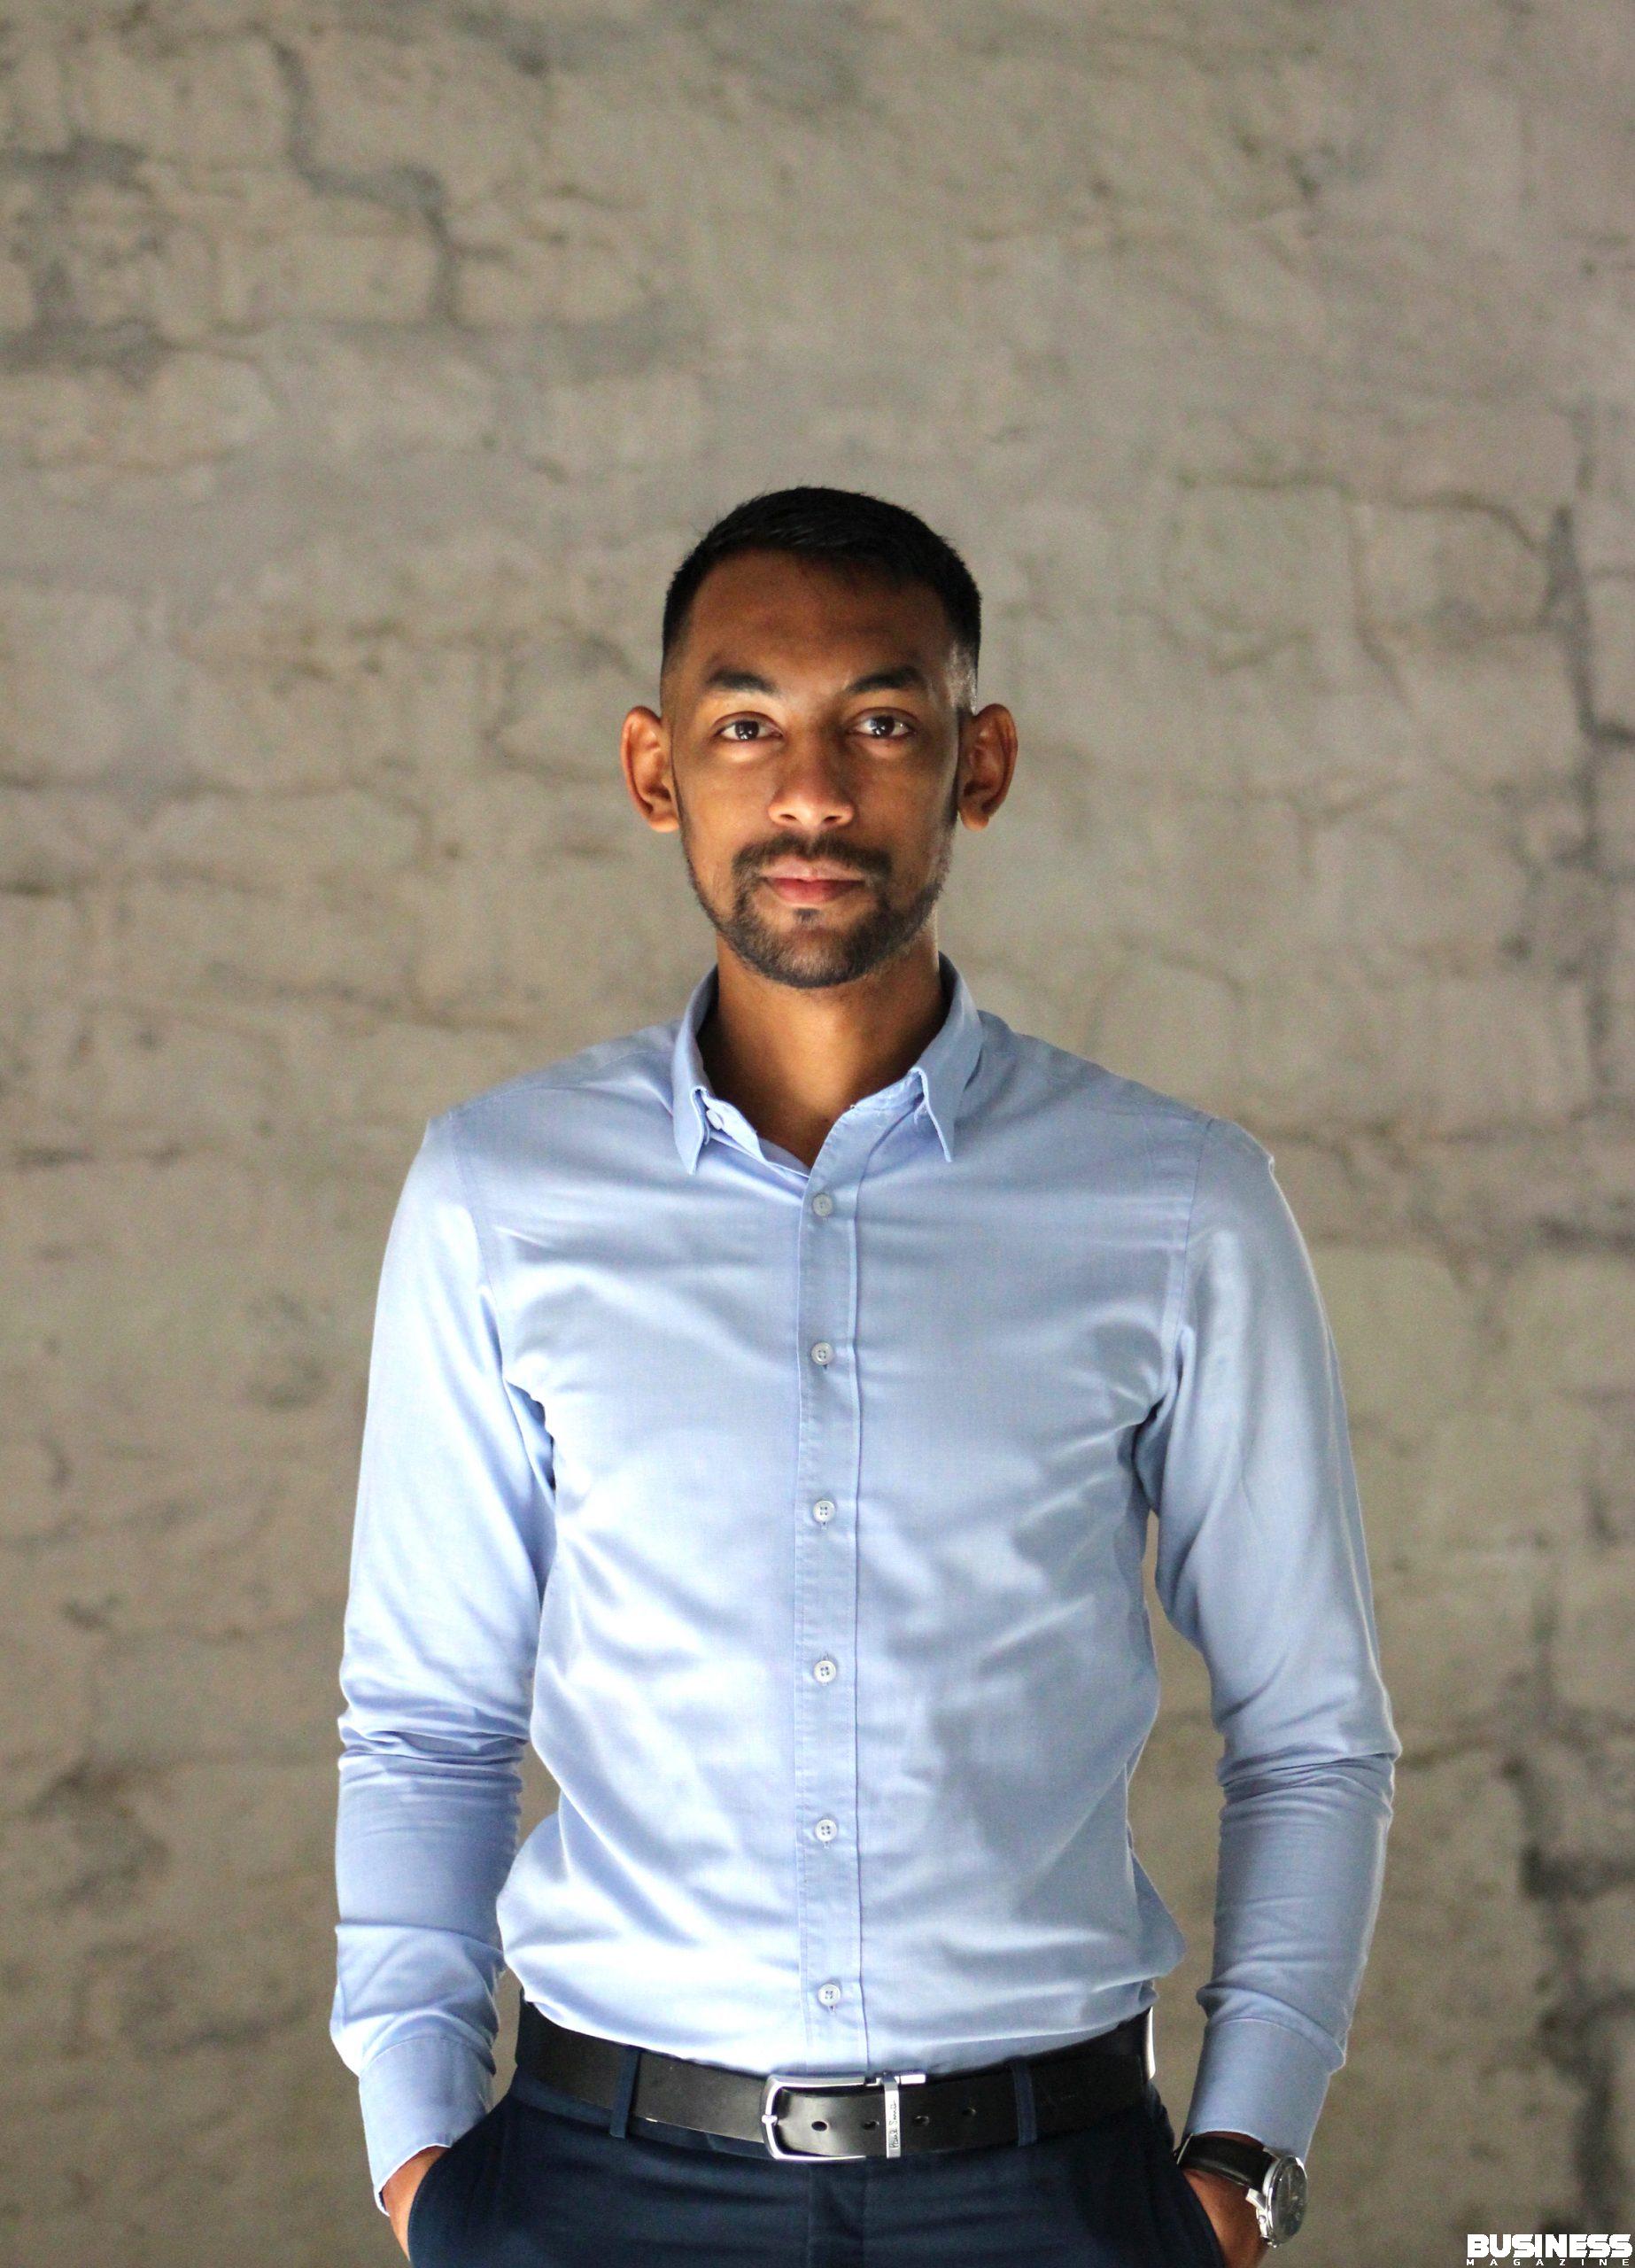 Jason Bholanauth - fondateur d'Inbound Mauritius